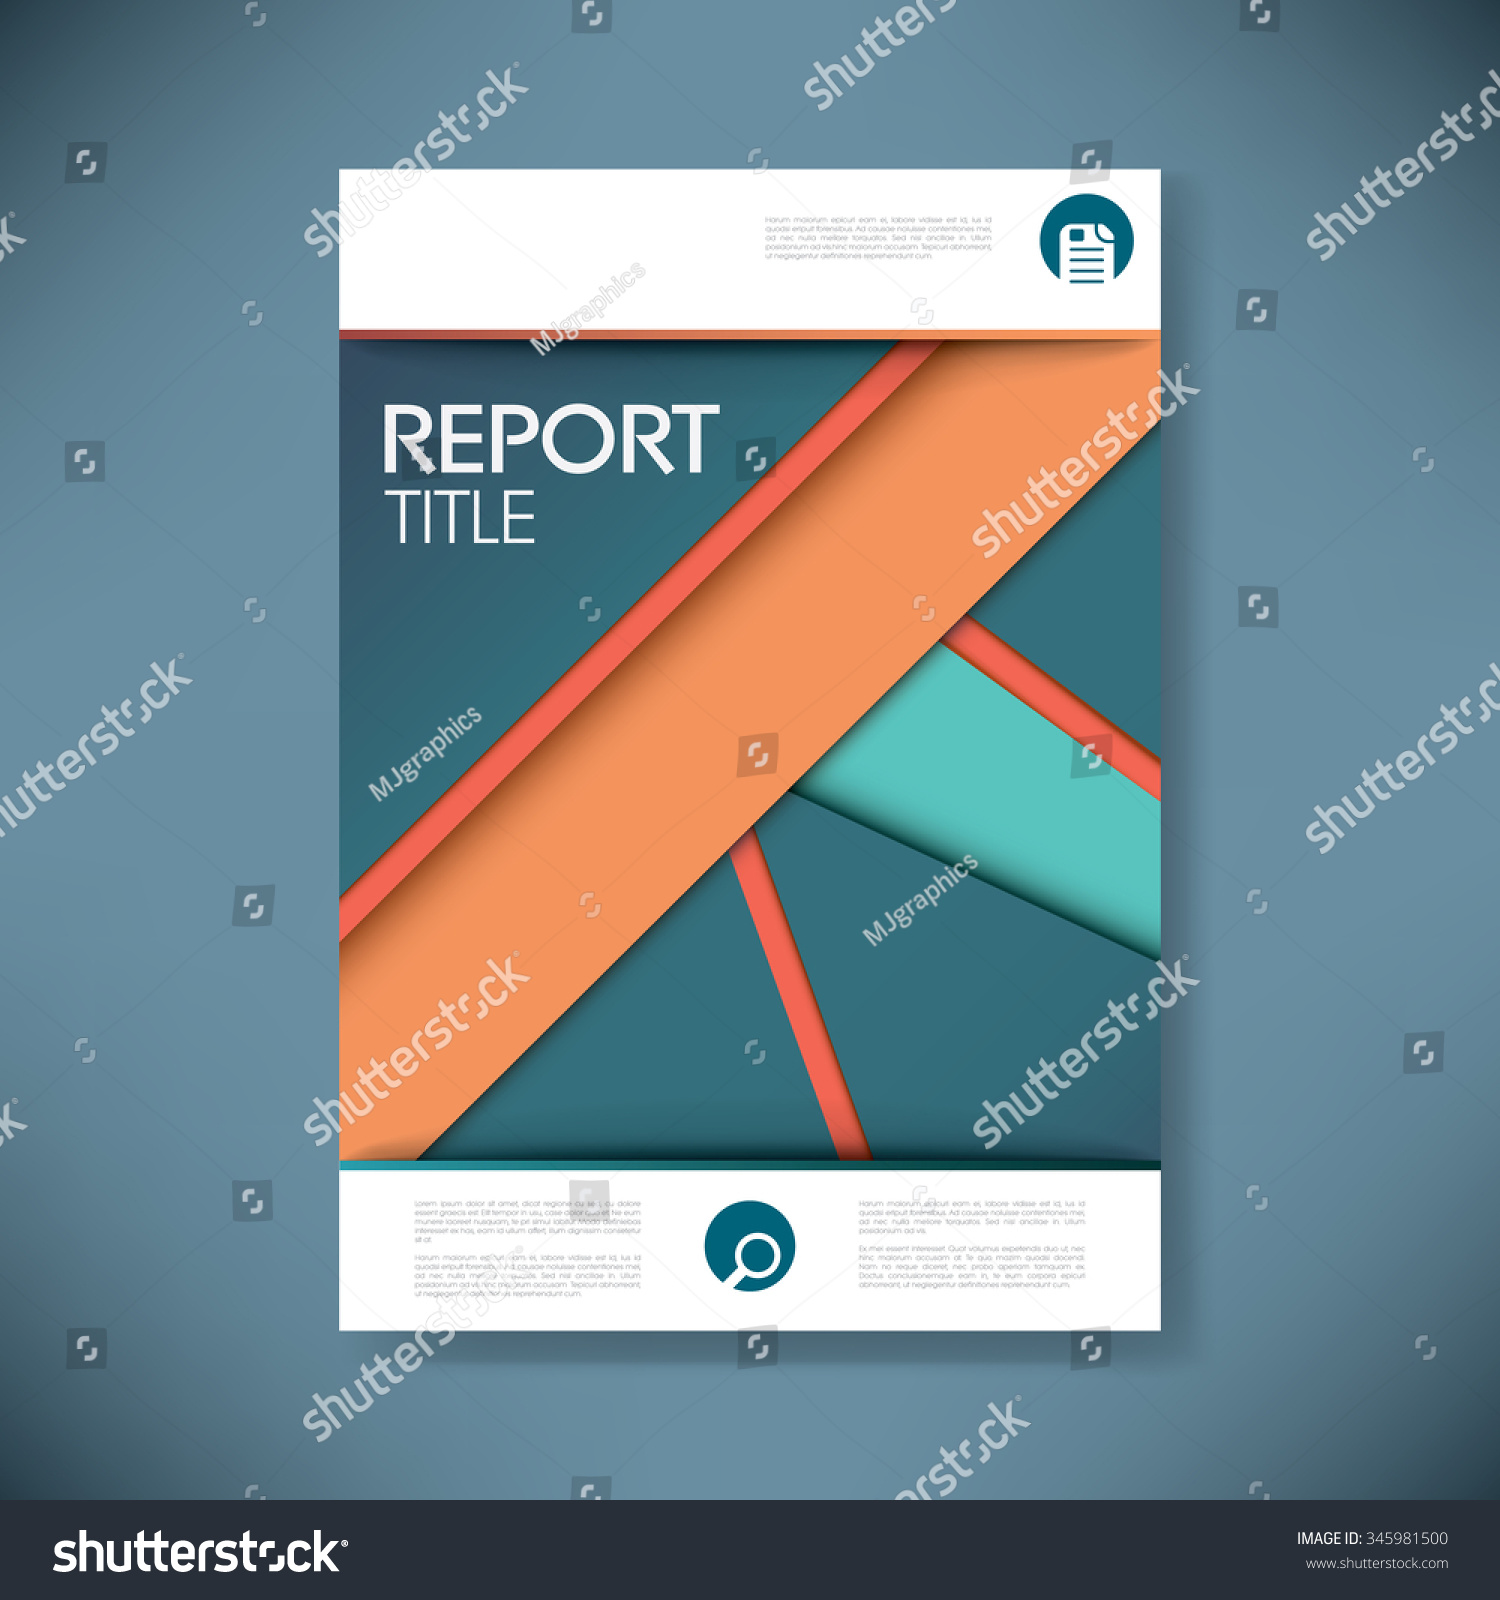 report cover template business presentation brochure stock vector, Presentation templates